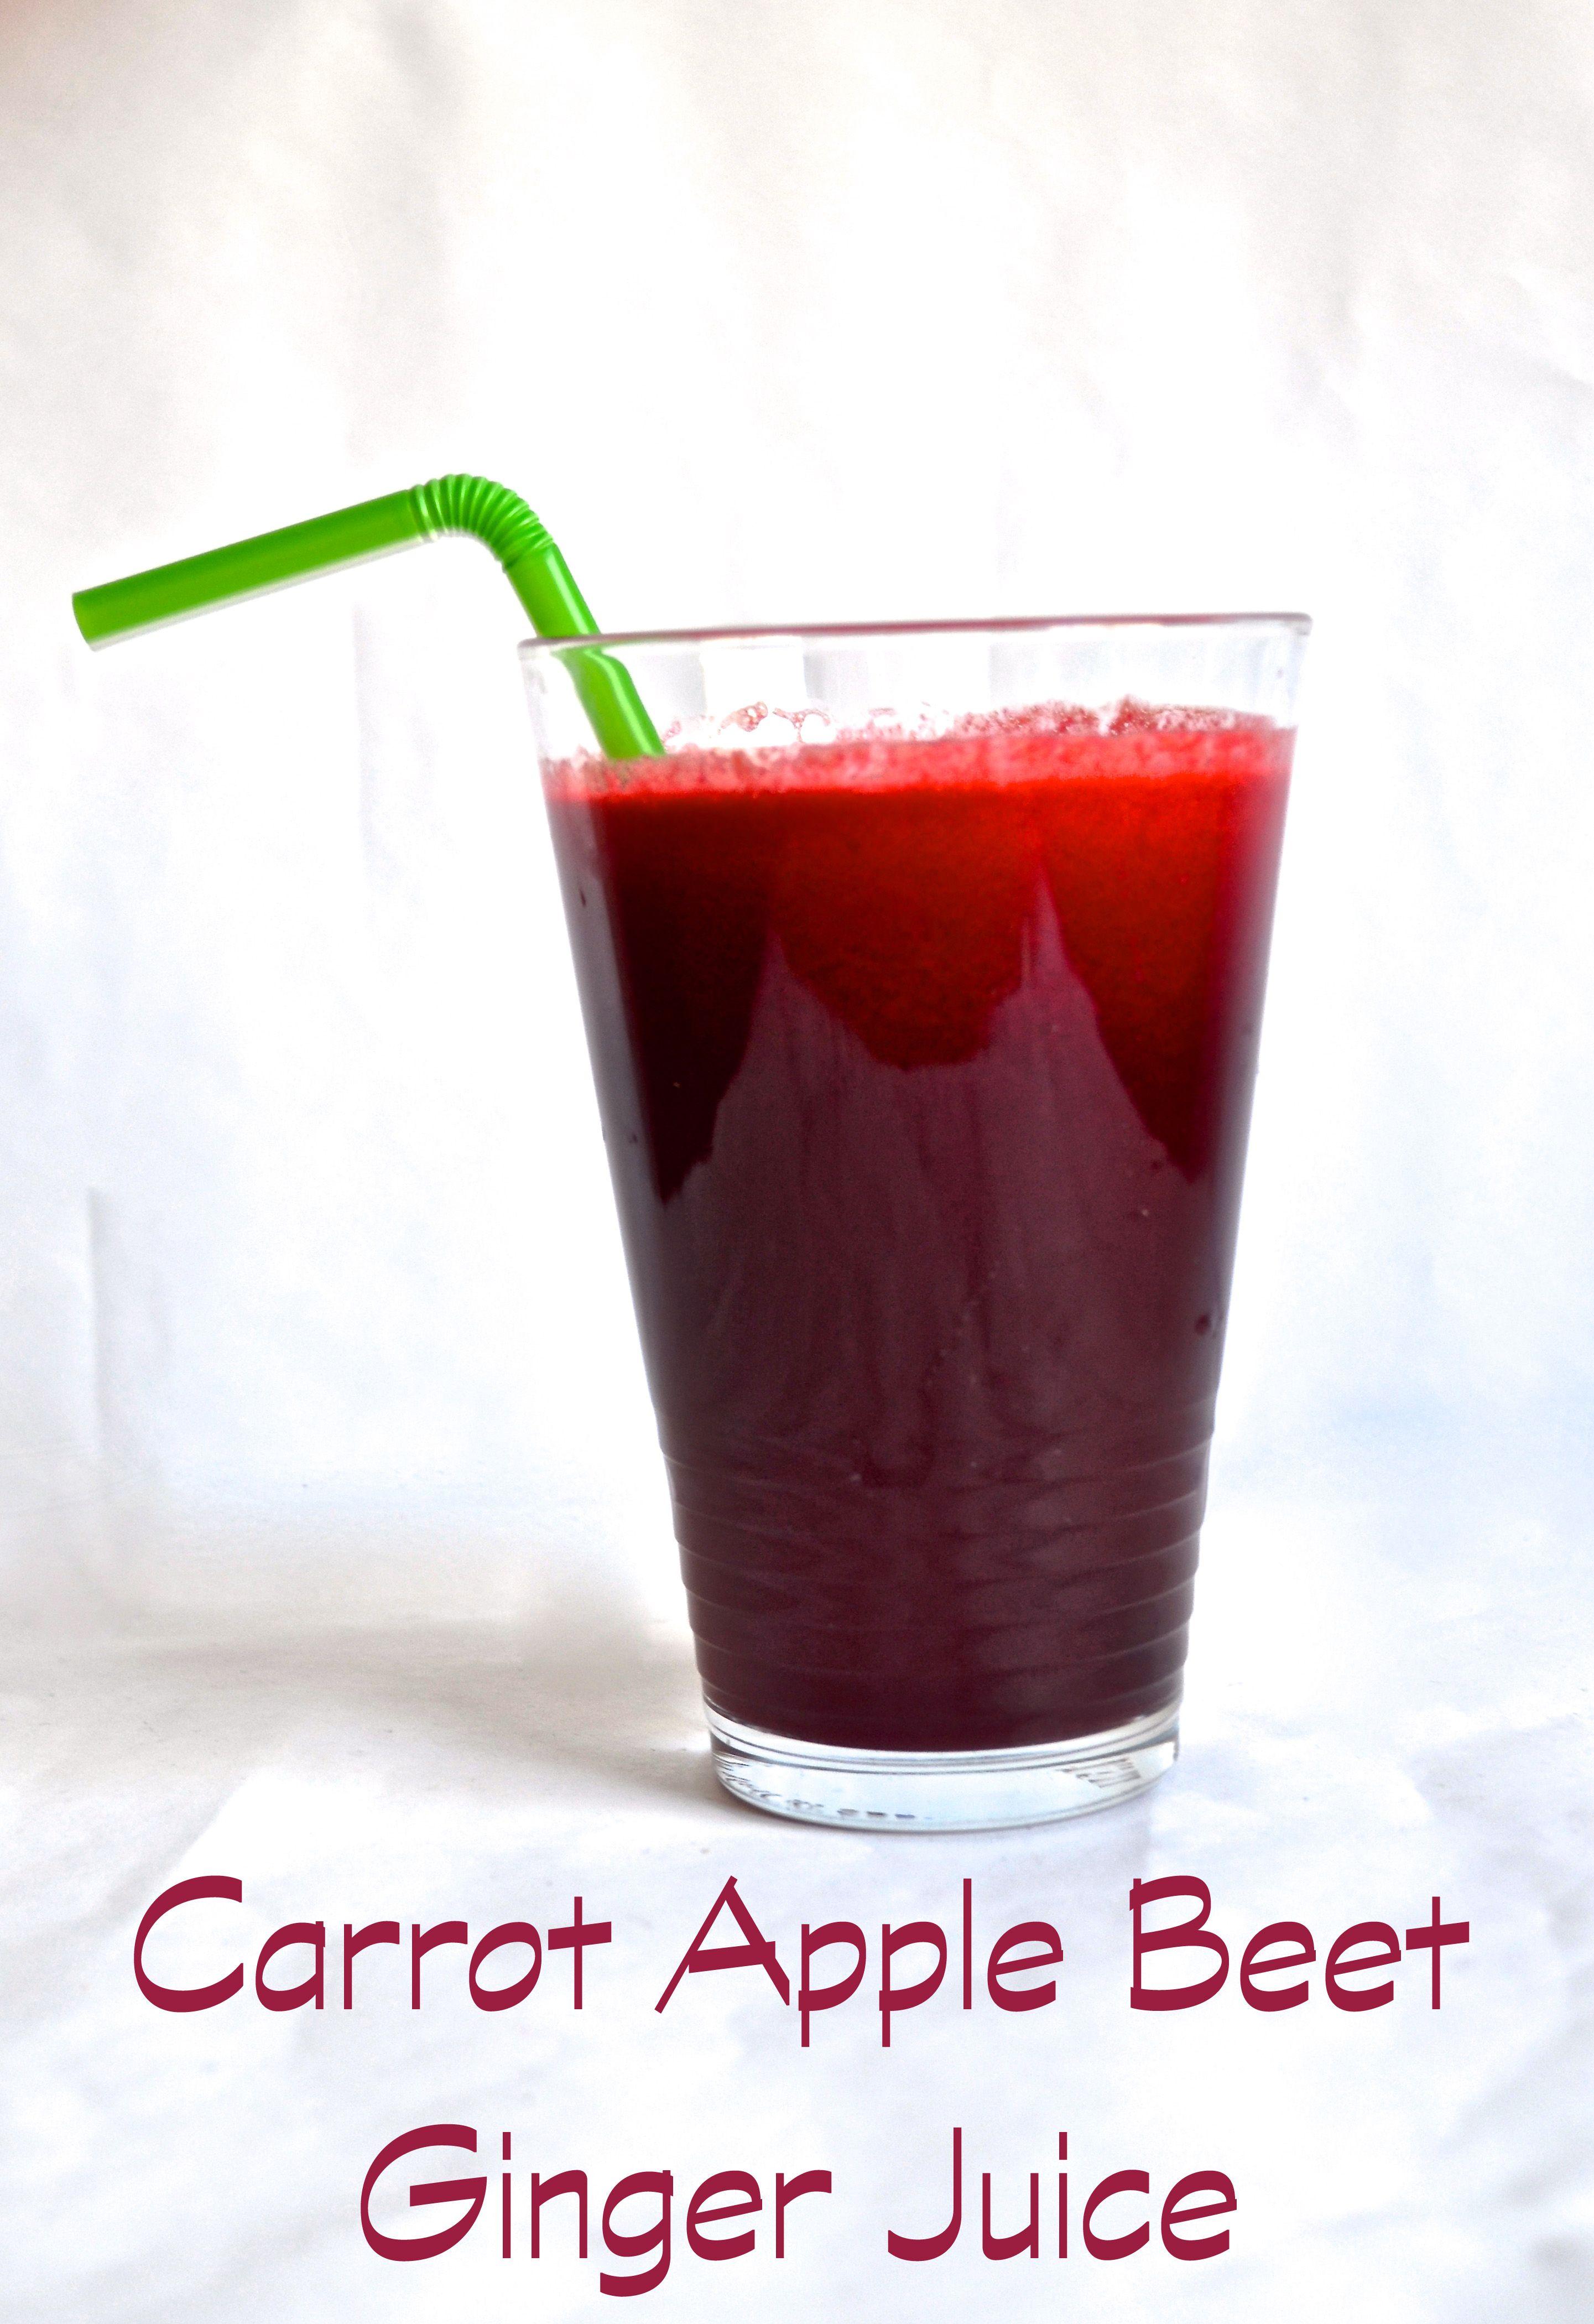 Carrot apple beet ginger juice pale yellow juice recipes carrot apple beet ginger juice pale yellow malvernweather Choice Image